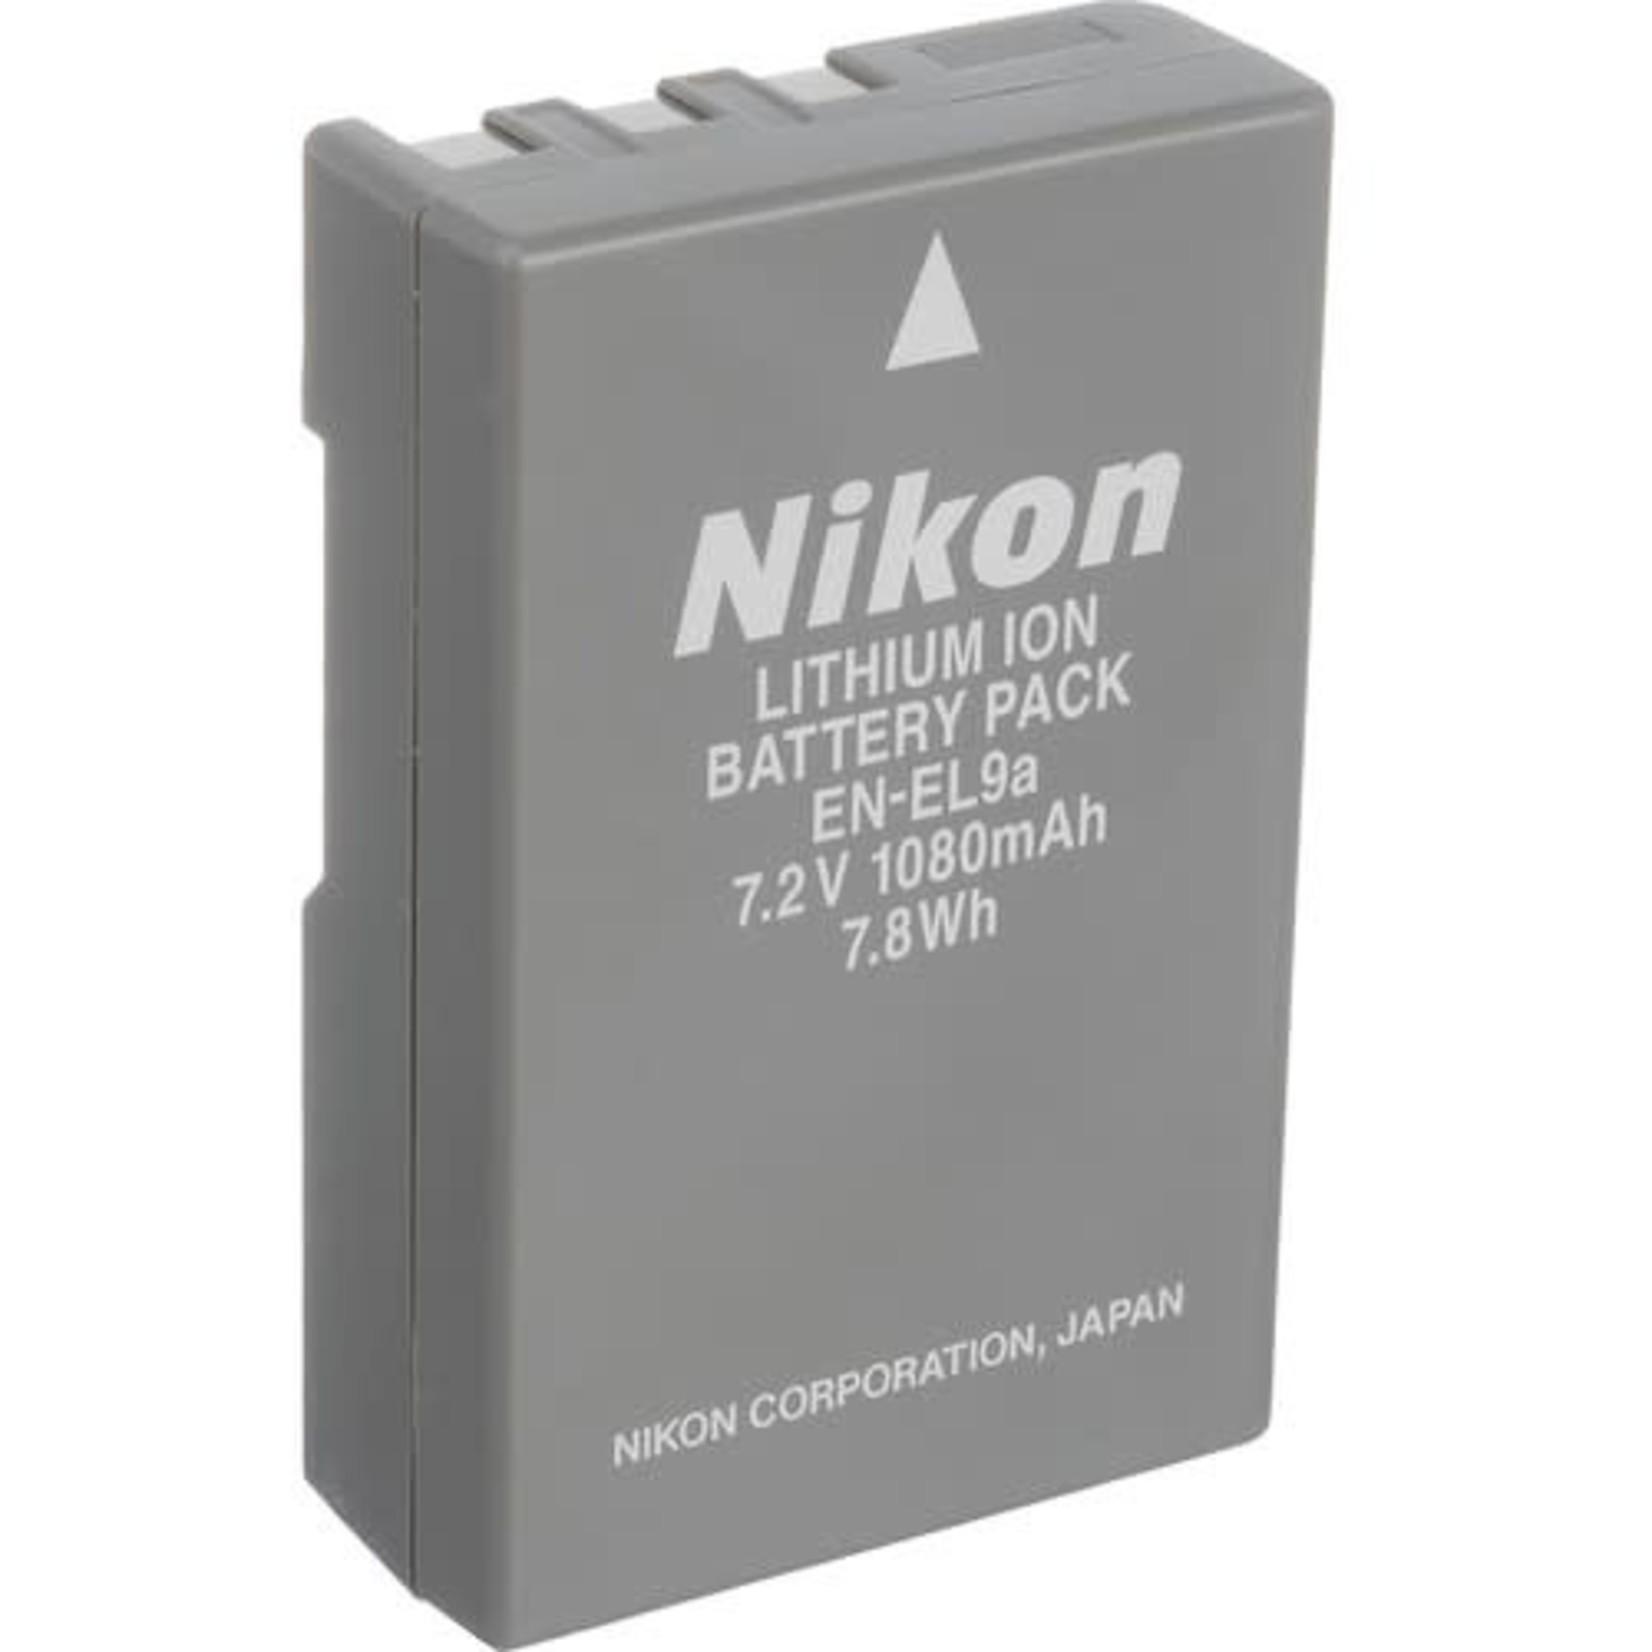 Nikon Nikon EN-EL9a Rechargeable Lithium-Ion Battery